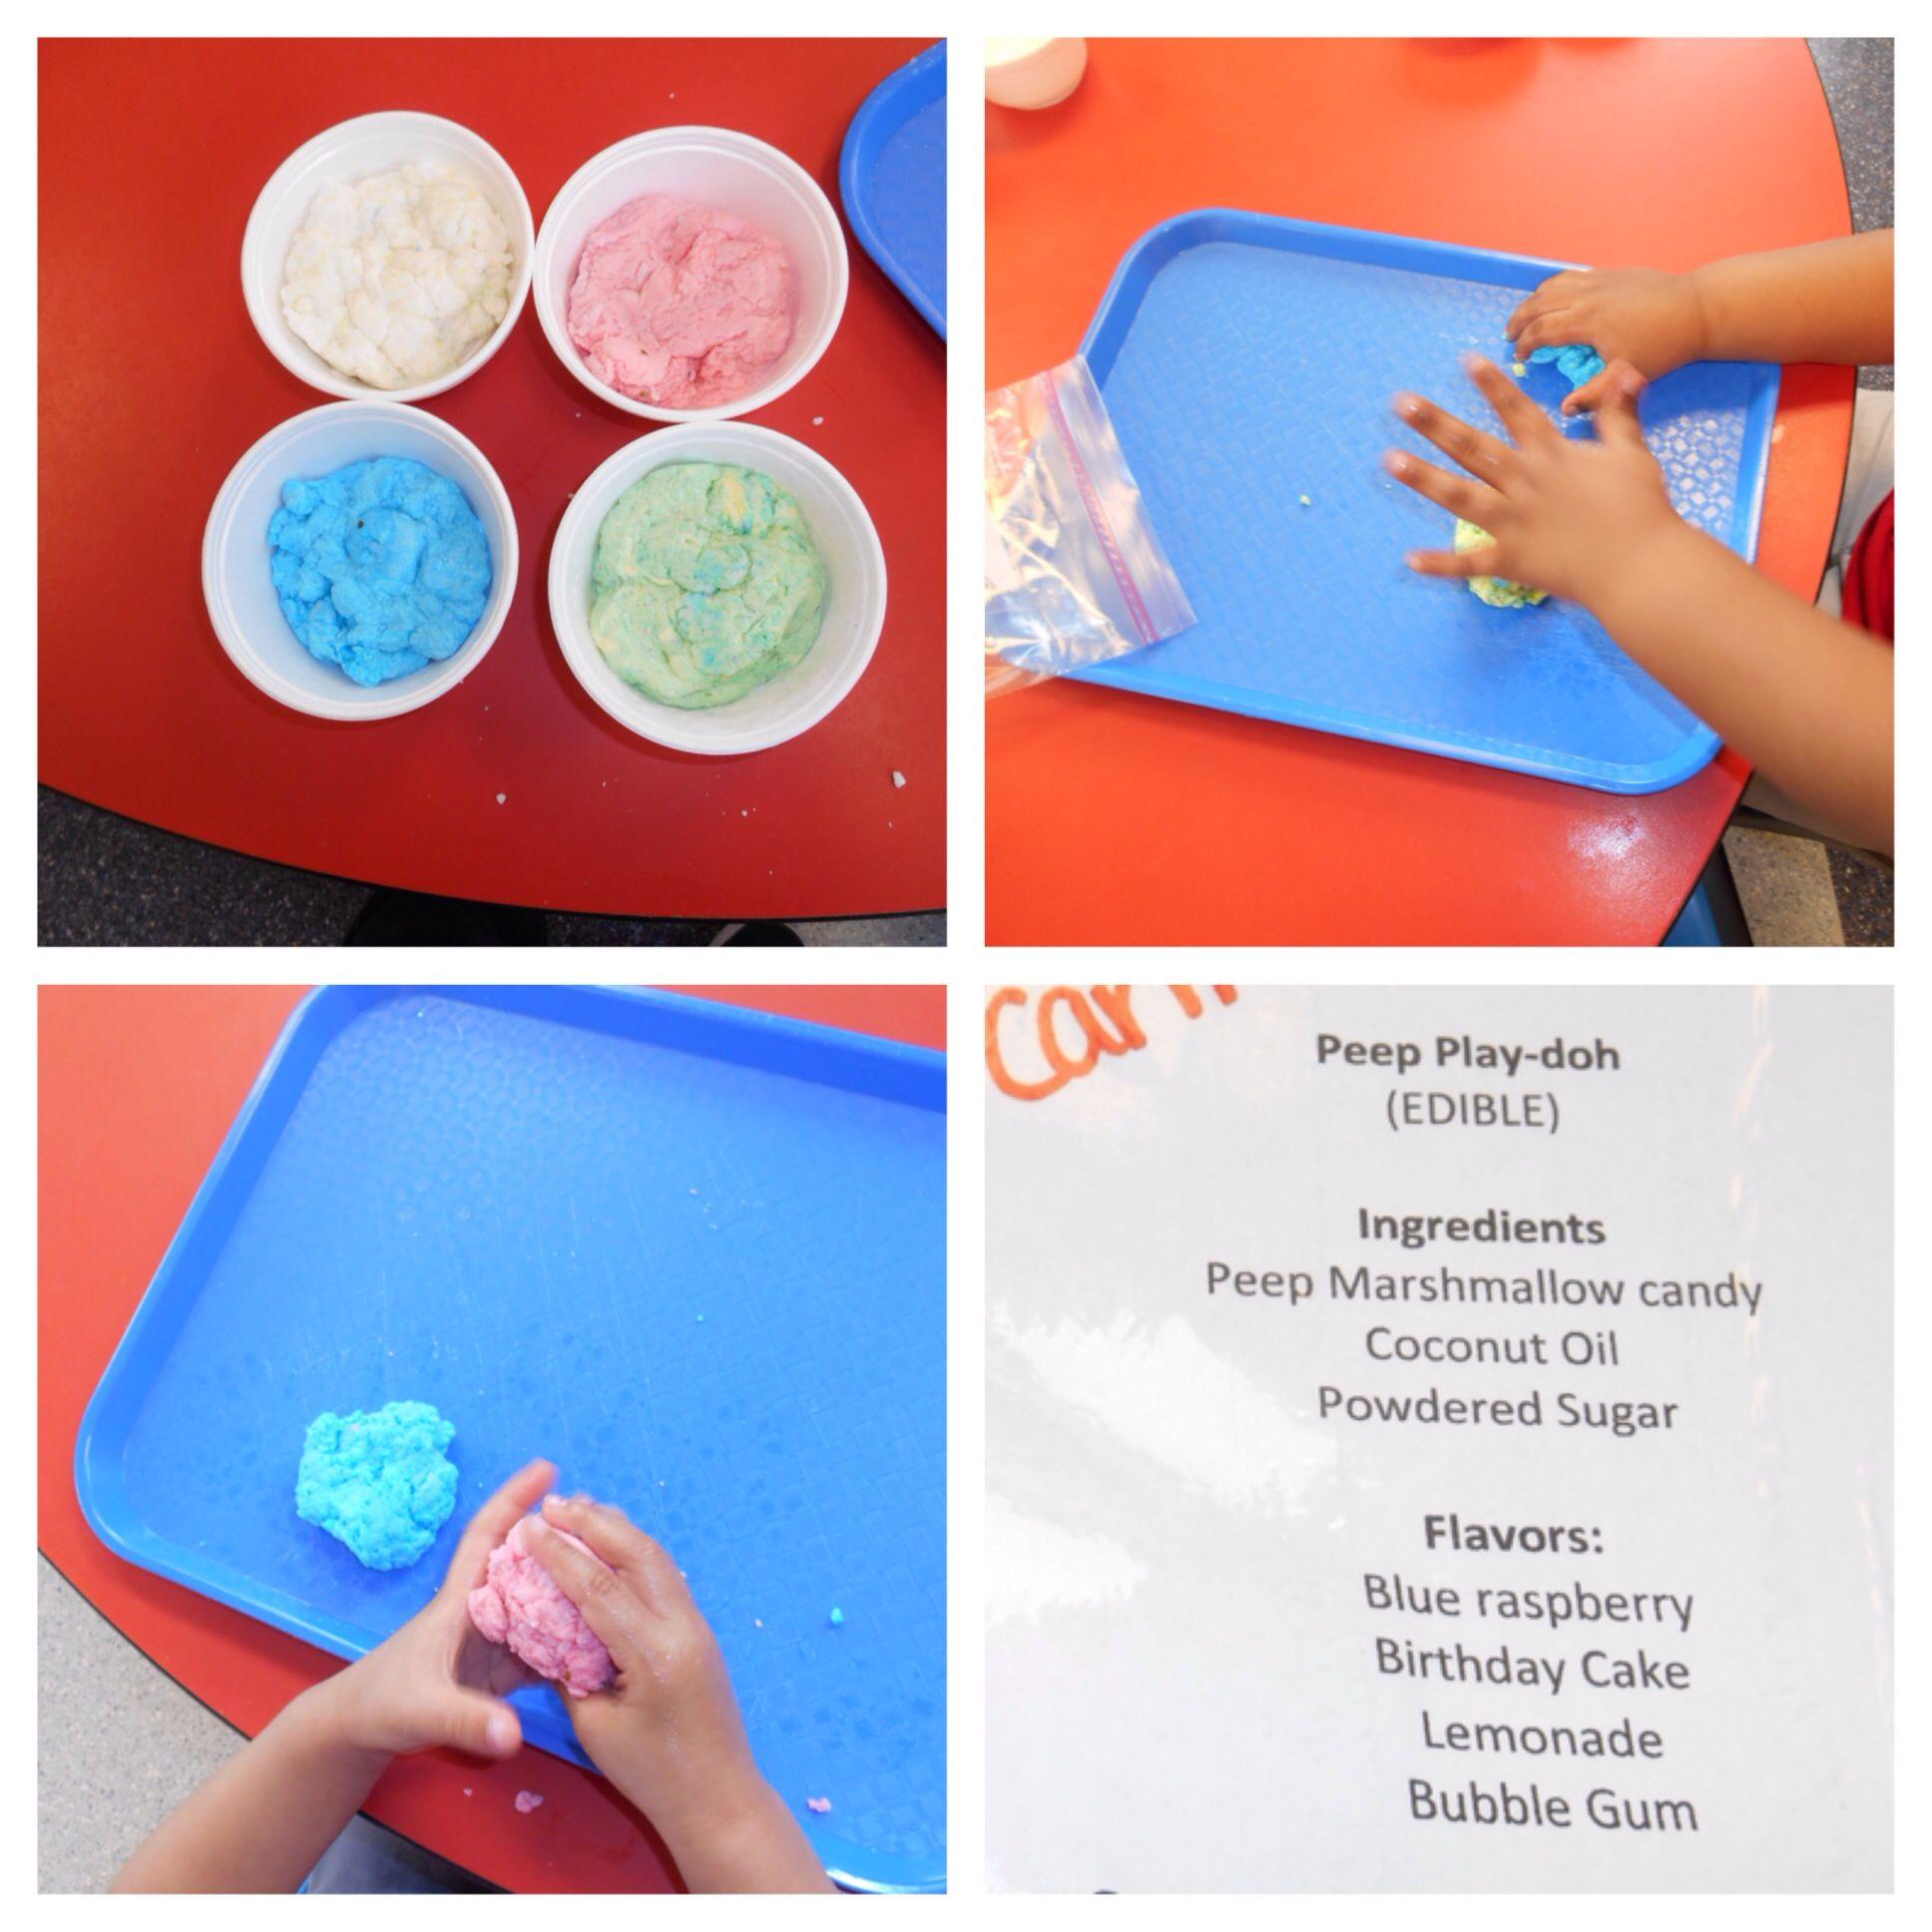 Peep playdoh: coconut oil, powdered sugar, blue raspberry peeps, lemonade peeps, birthday cake peeps and bubble gum peeps